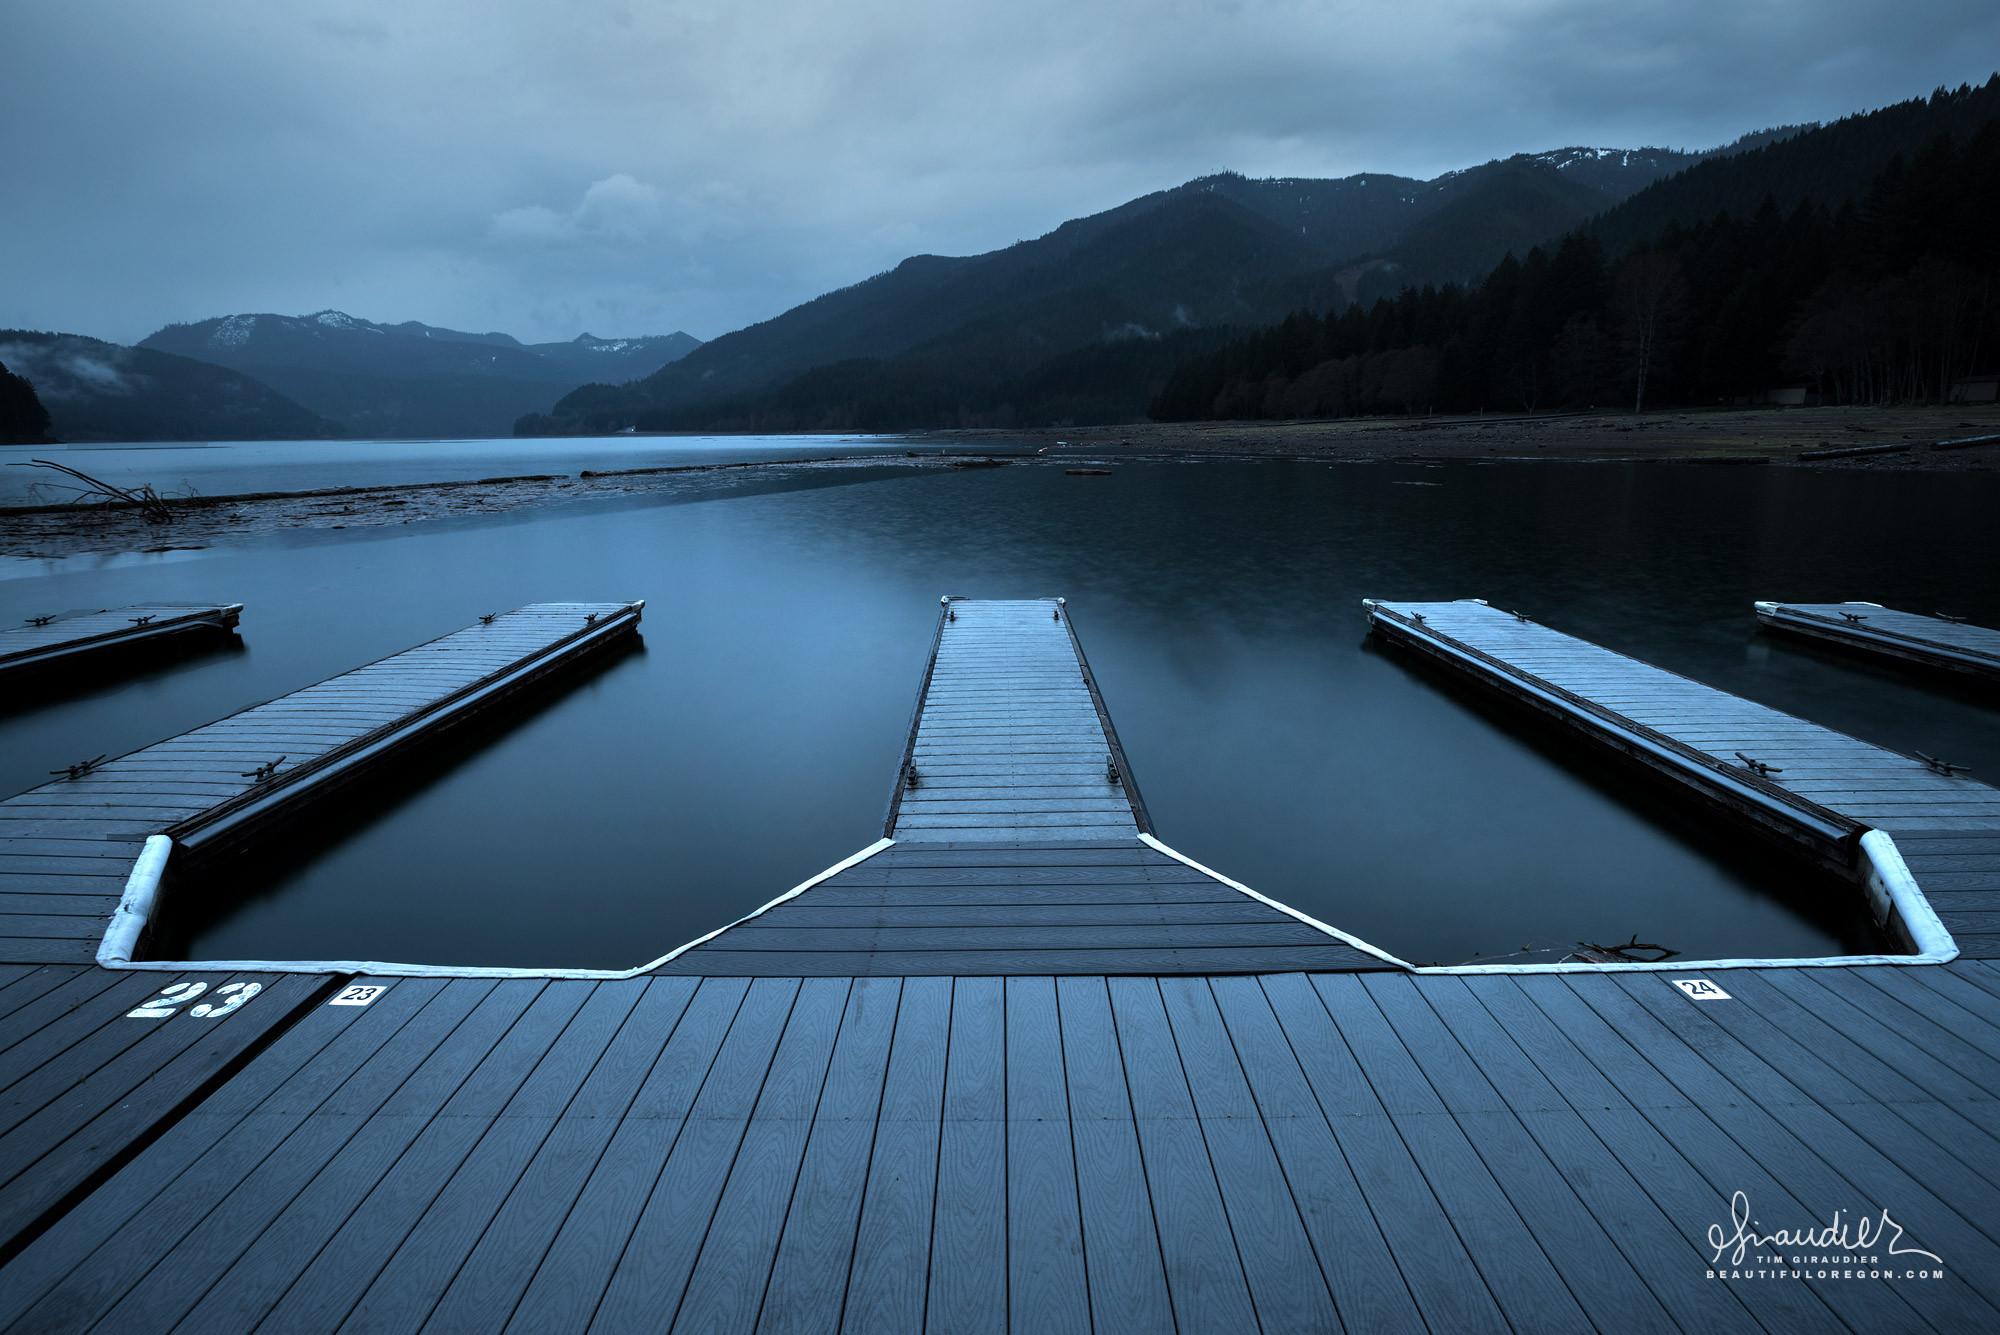 Detroit Reservoir, marina, Willamette National Forest, Oregon Cascades recreation